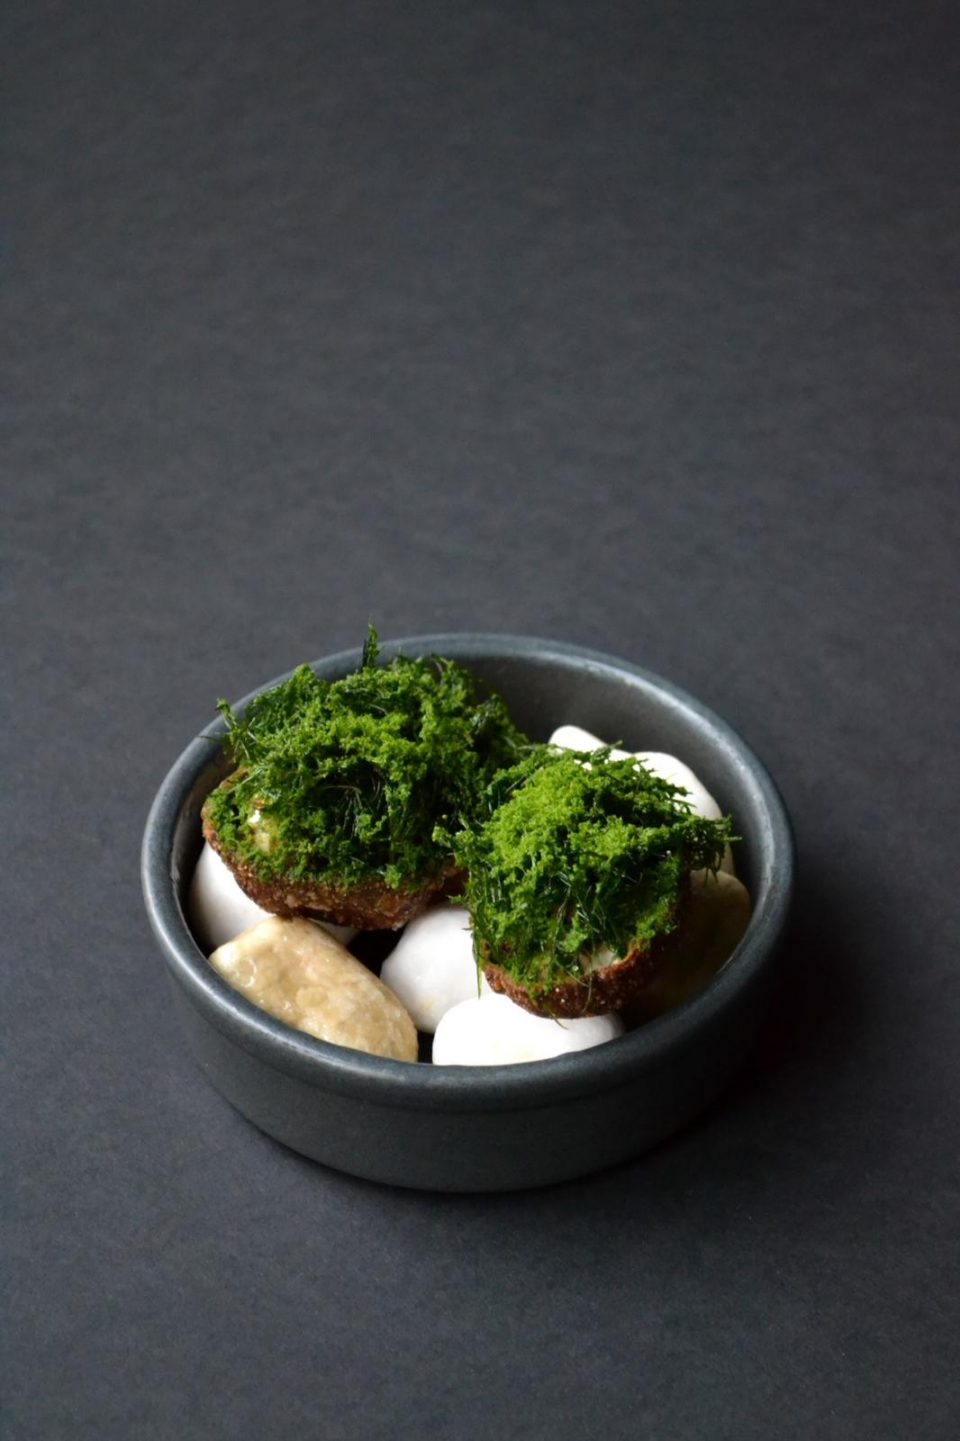 Cured Bream with Malt Puff & Frozen Greens